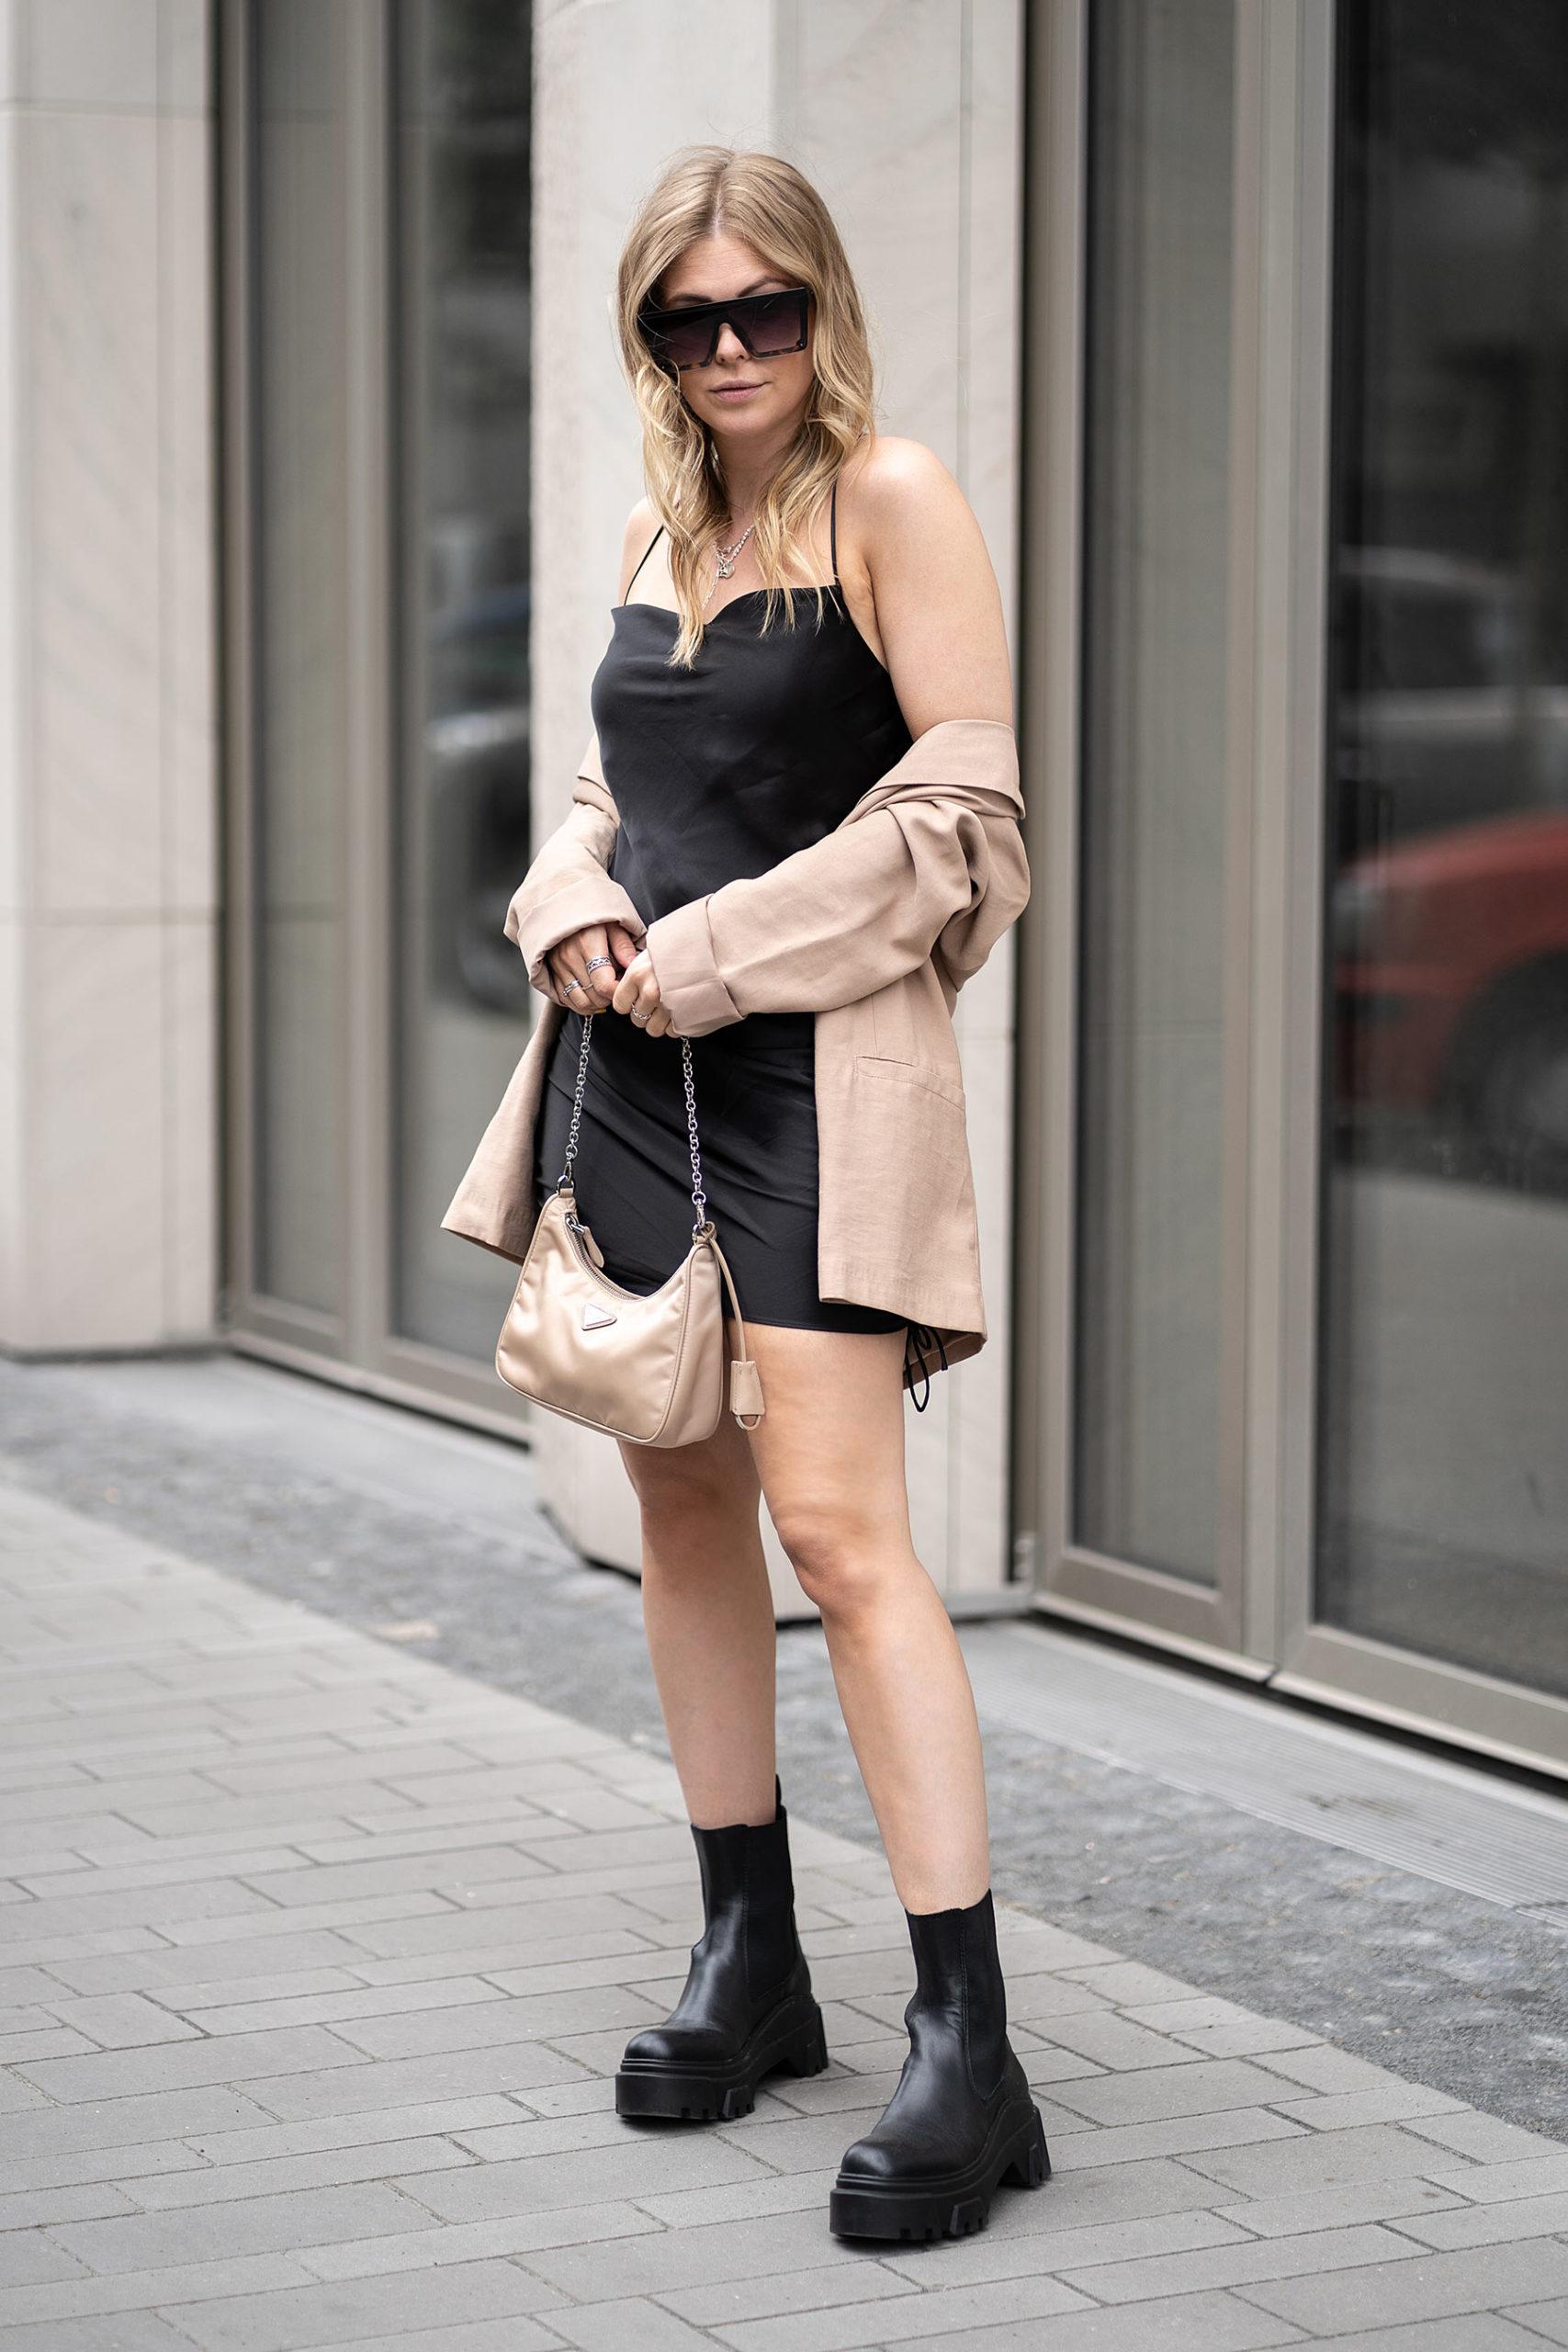 inga brauer fashion blogger düsseldorf satinkleid outfit streetstyle sunnyinga